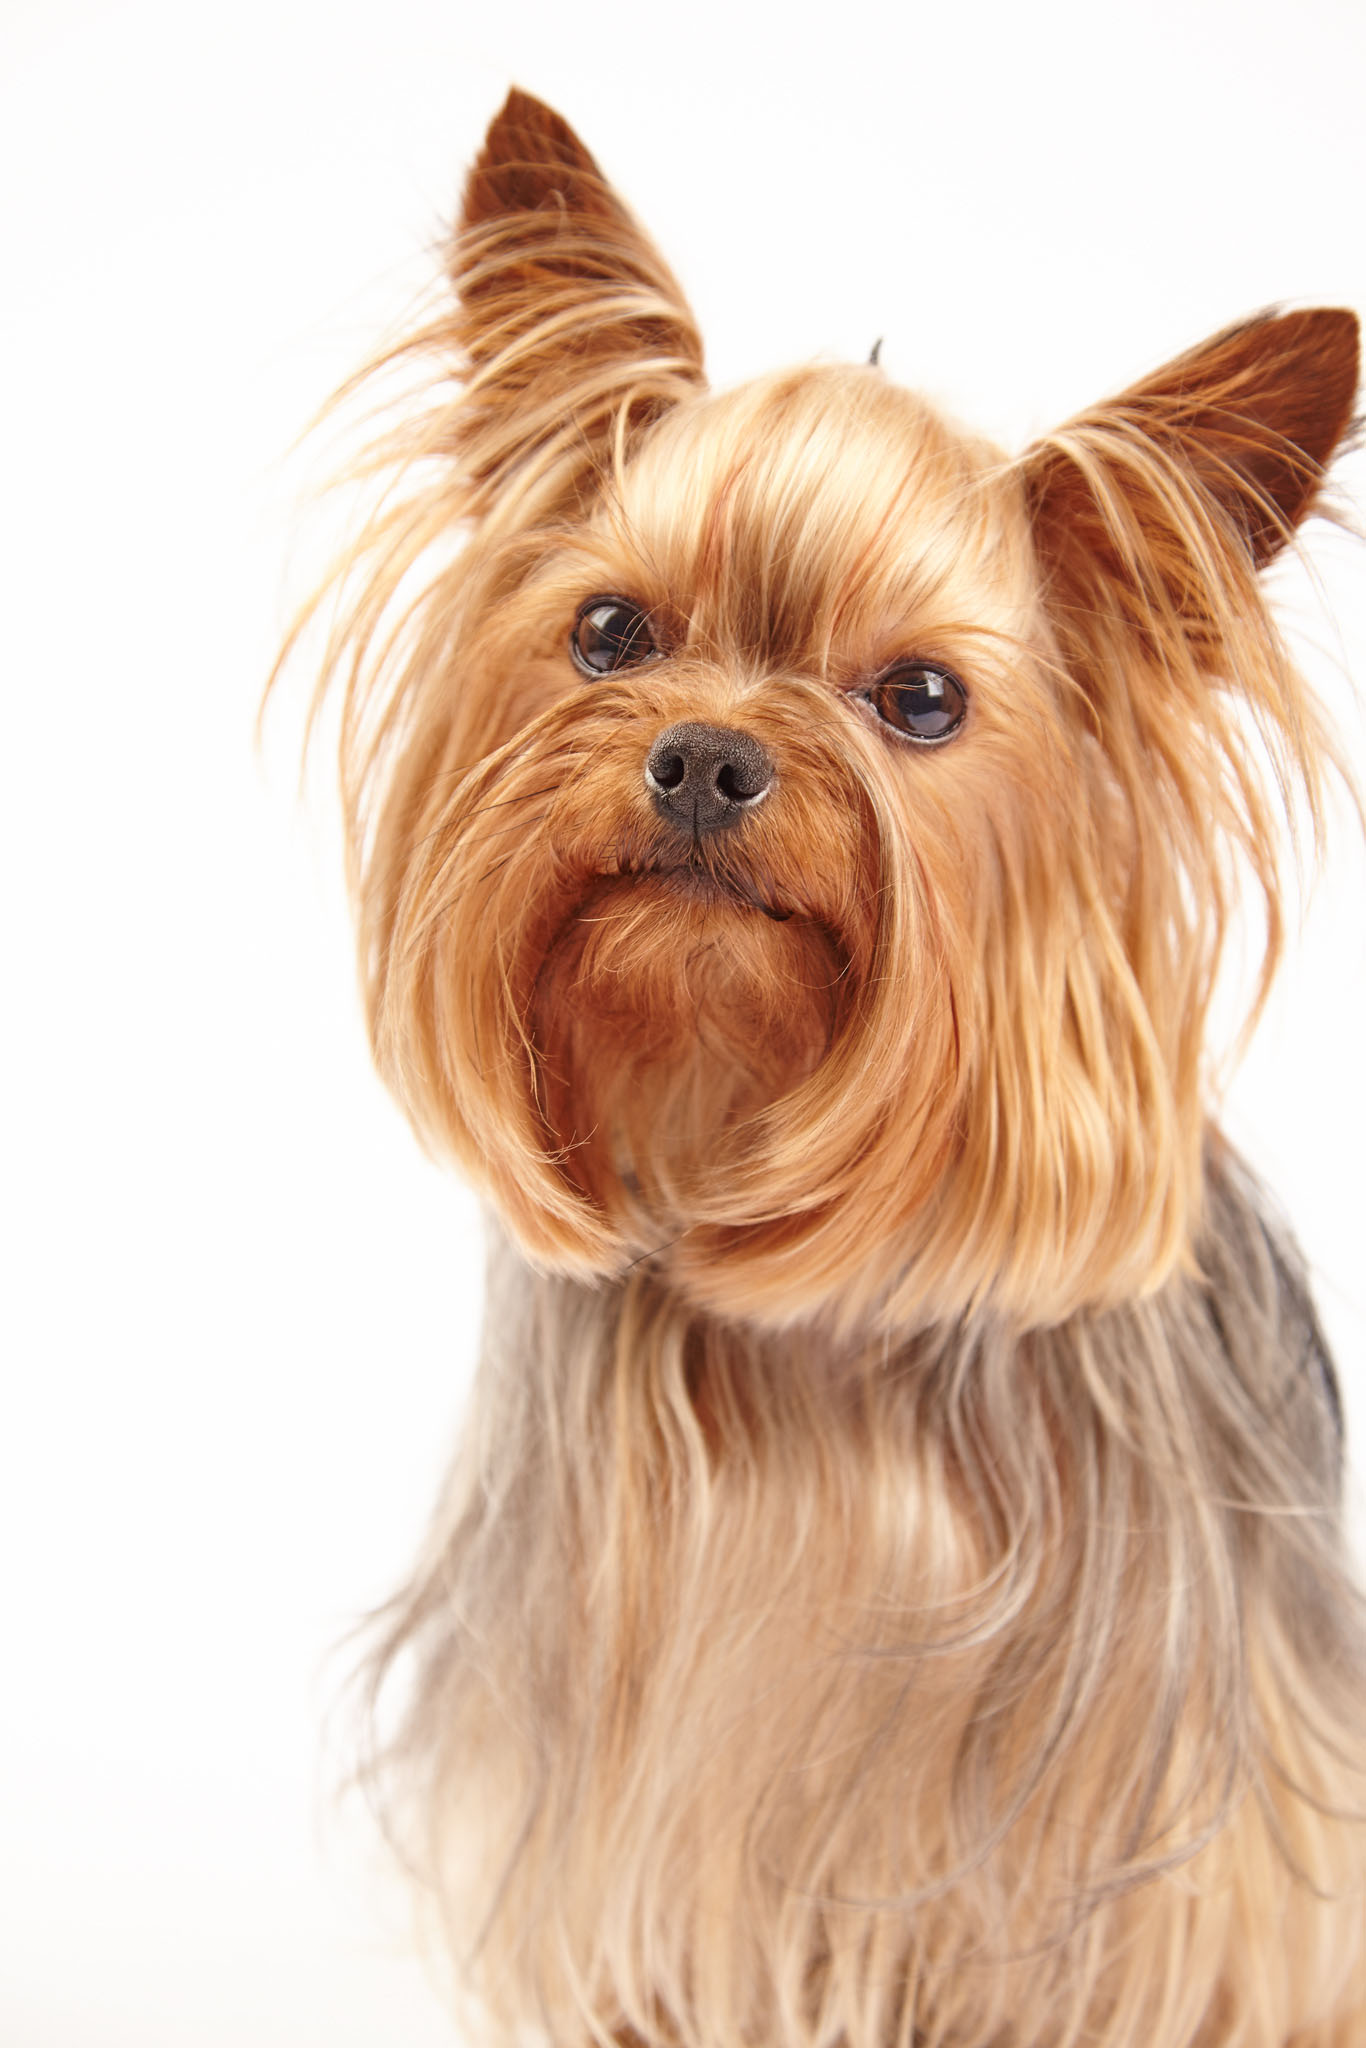 boprey-pet-photography-studio-nyc_25.jpg